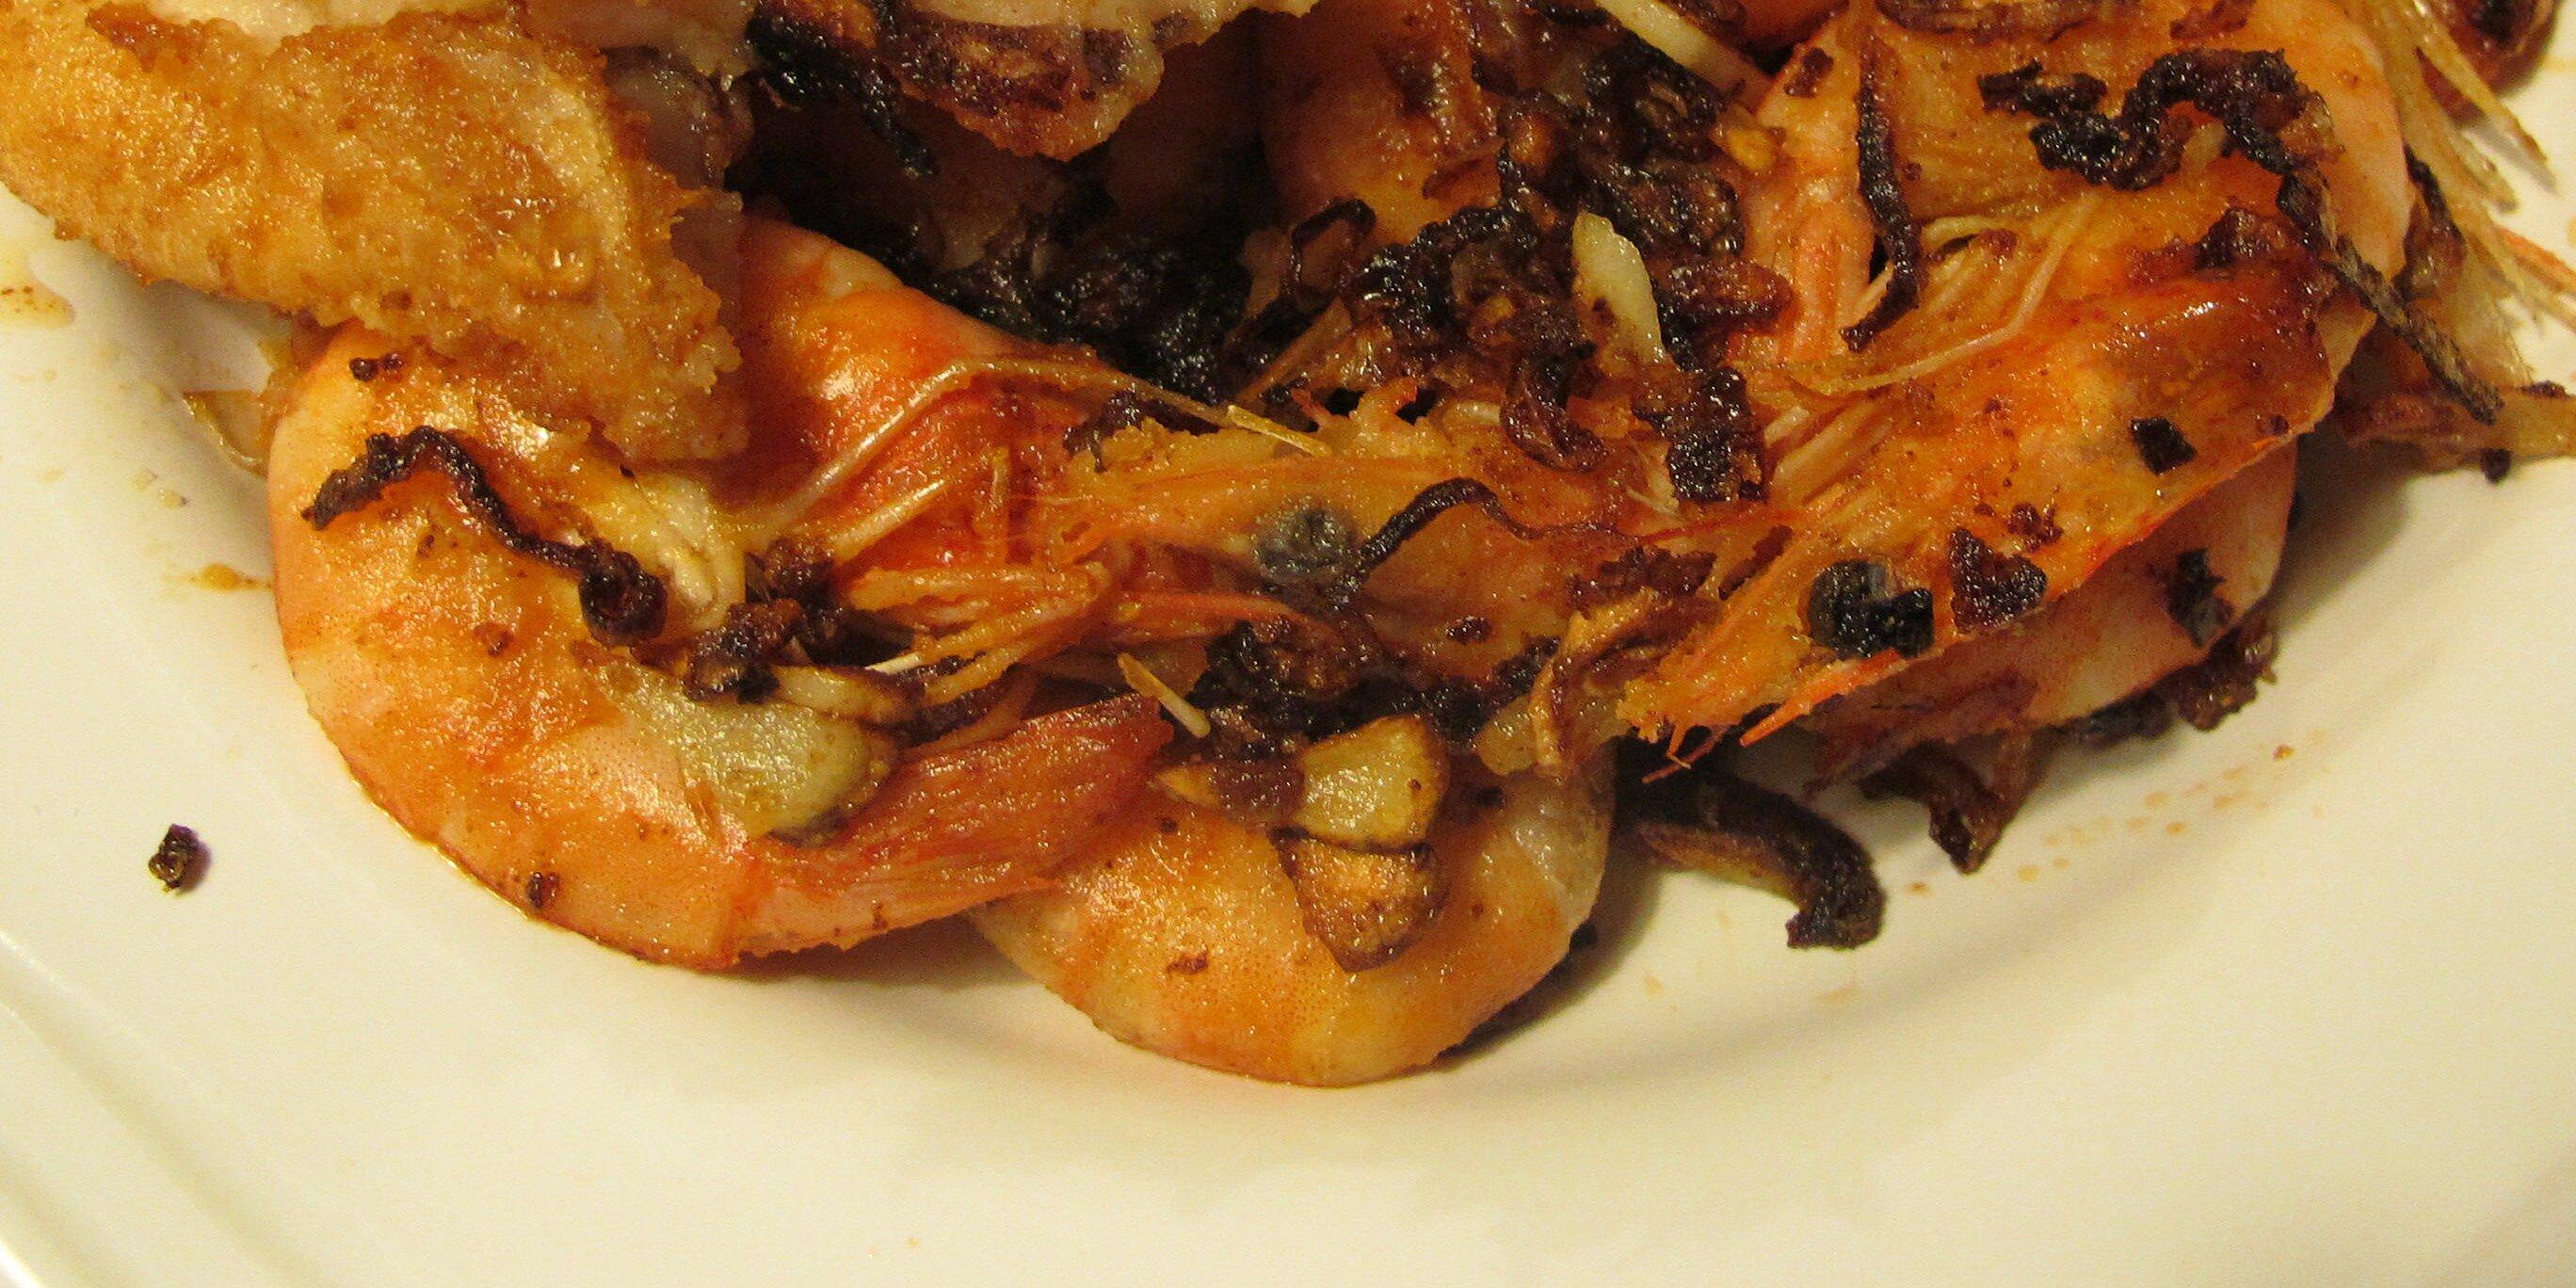 pan fried garlic shrimp recipe